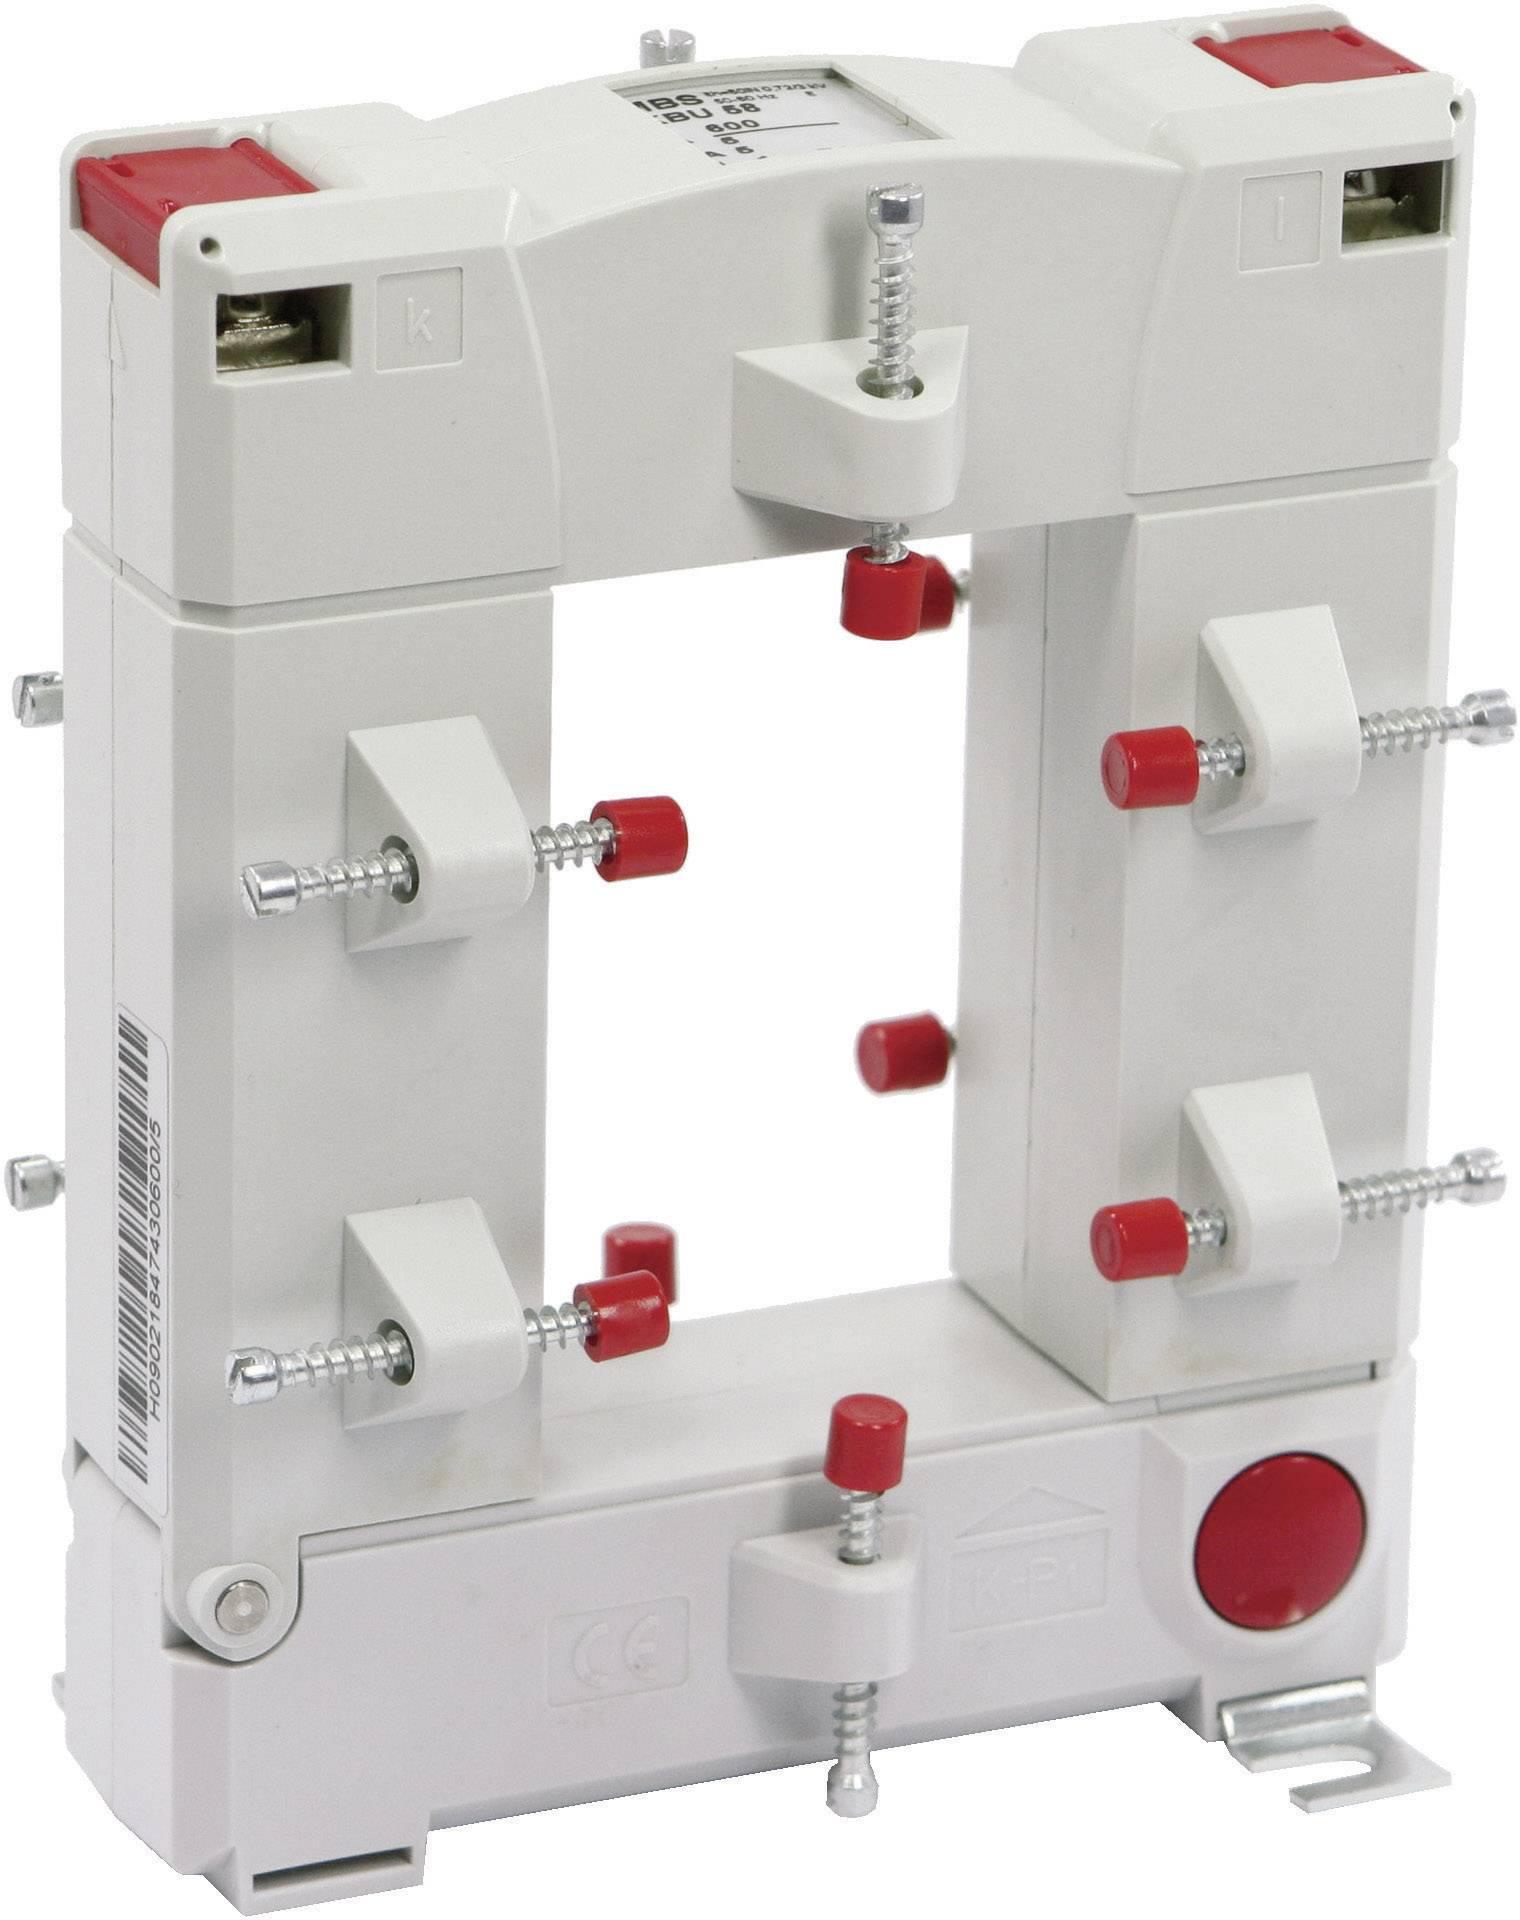 Zásuvný merací transformátor prúdu MBS KBU 58 600/5 A 5VA Kl.1